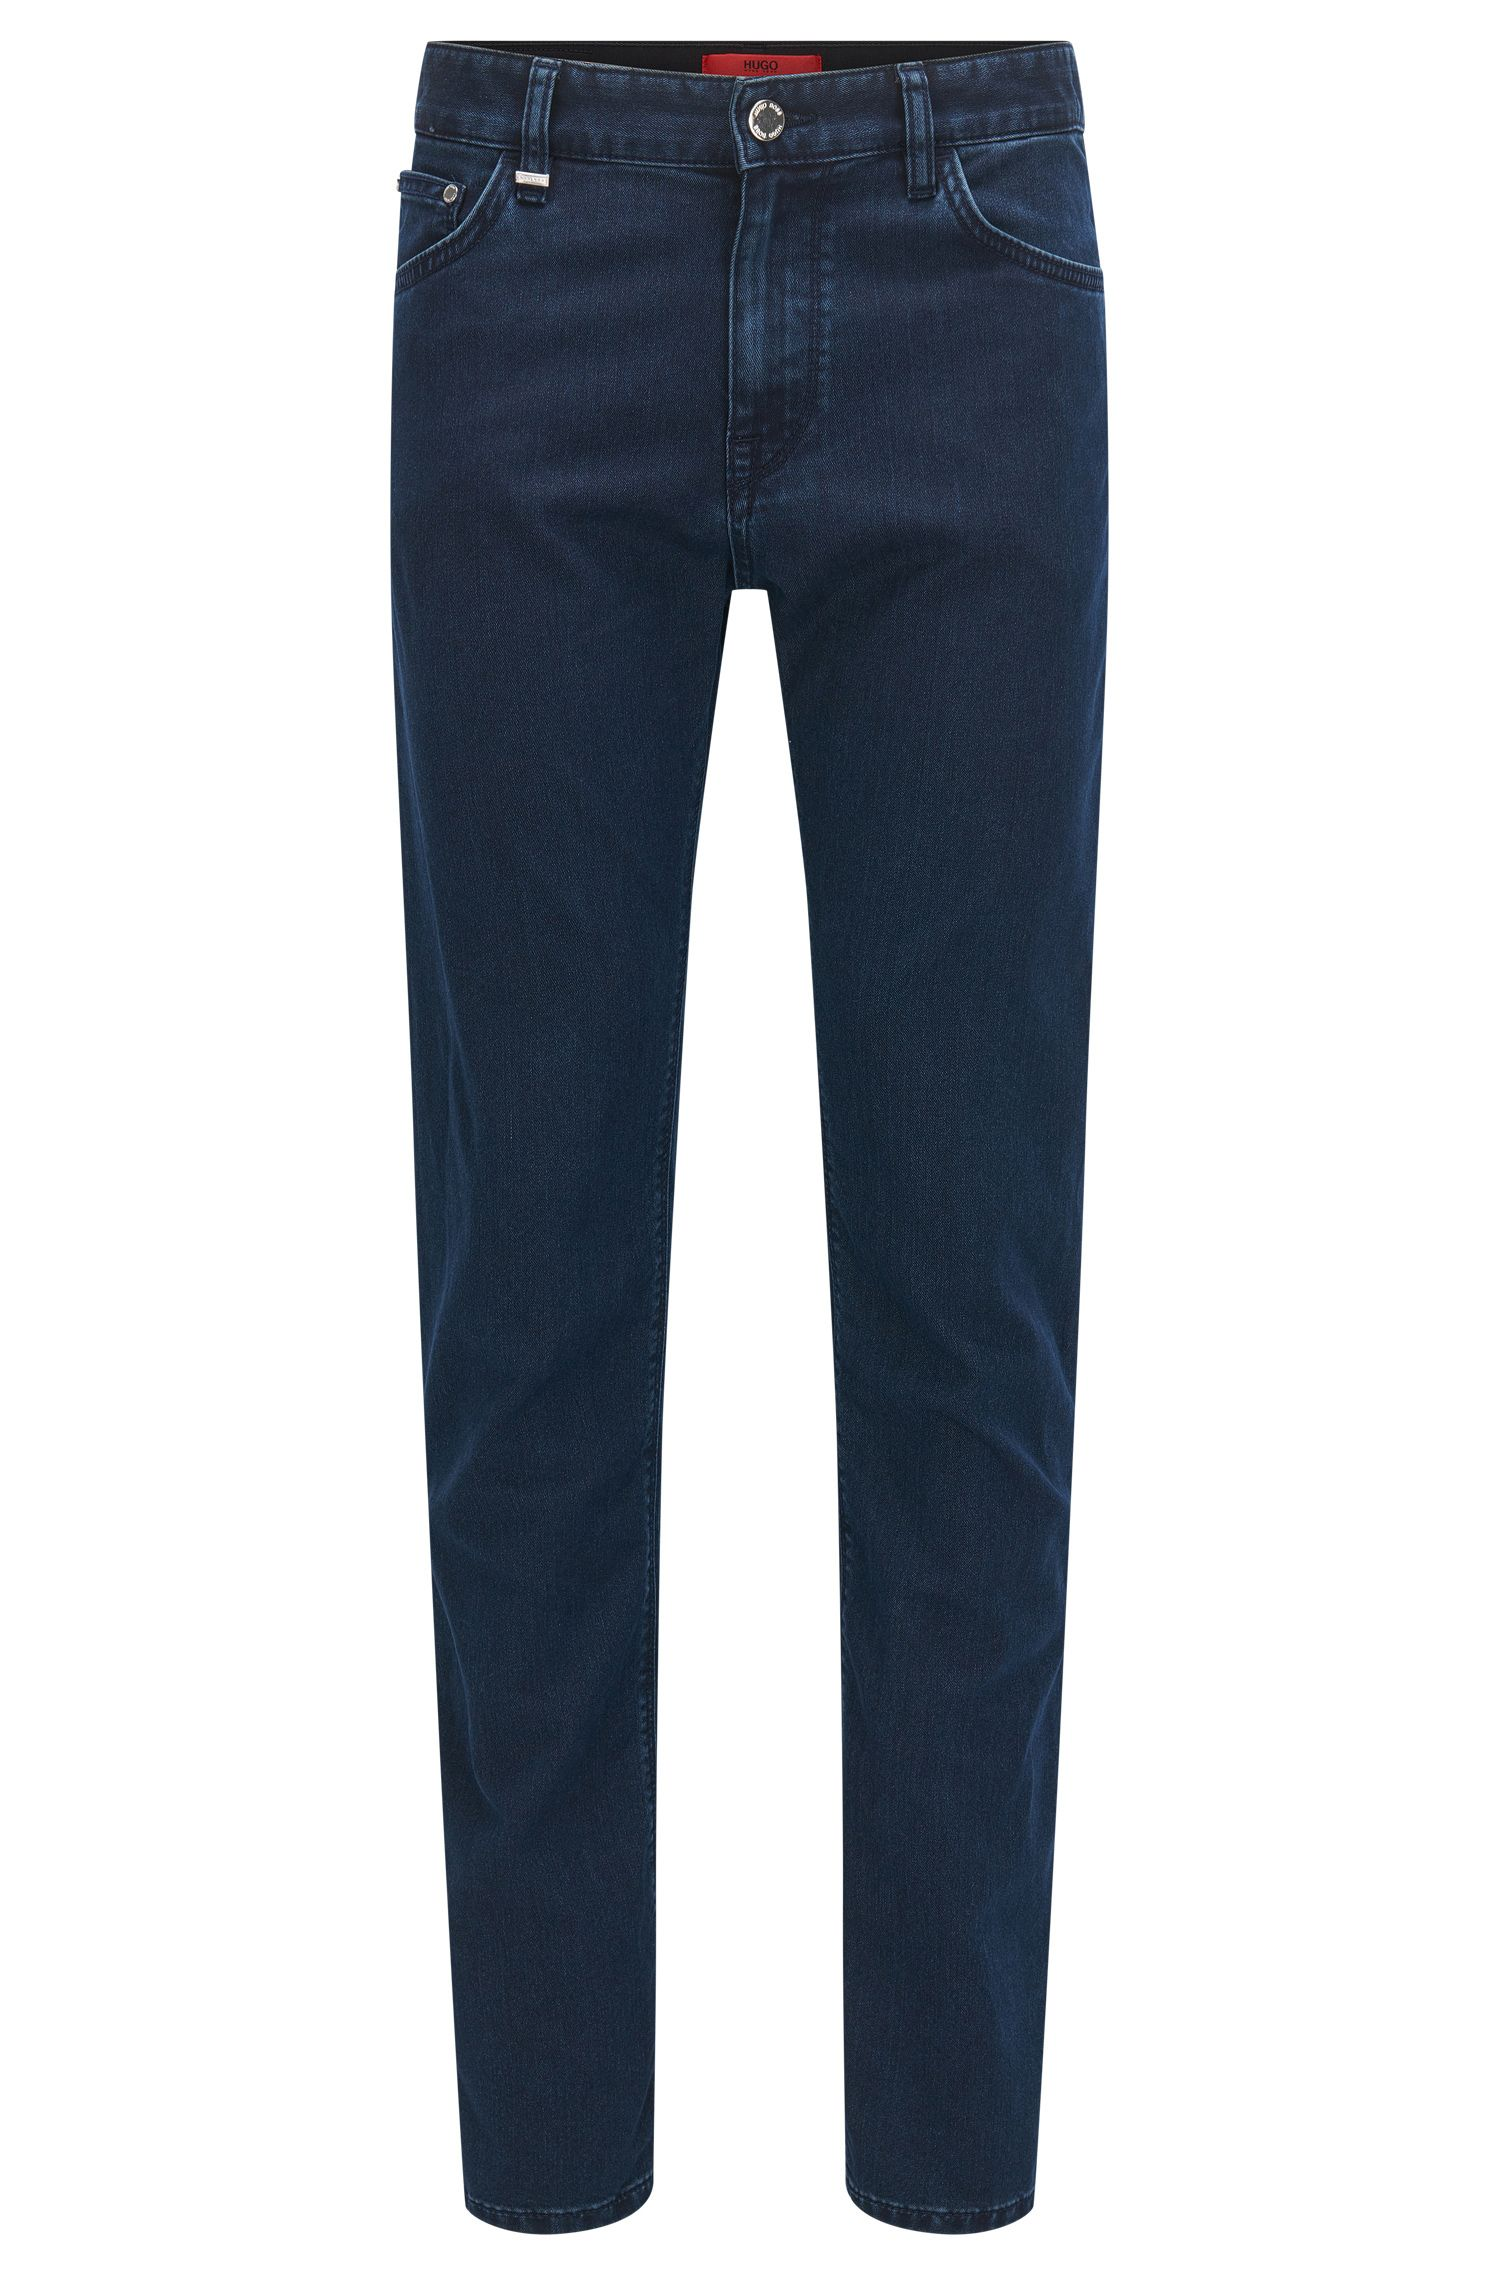 11 oz Stretch Cotton Jeans, Regular Fit | Maine